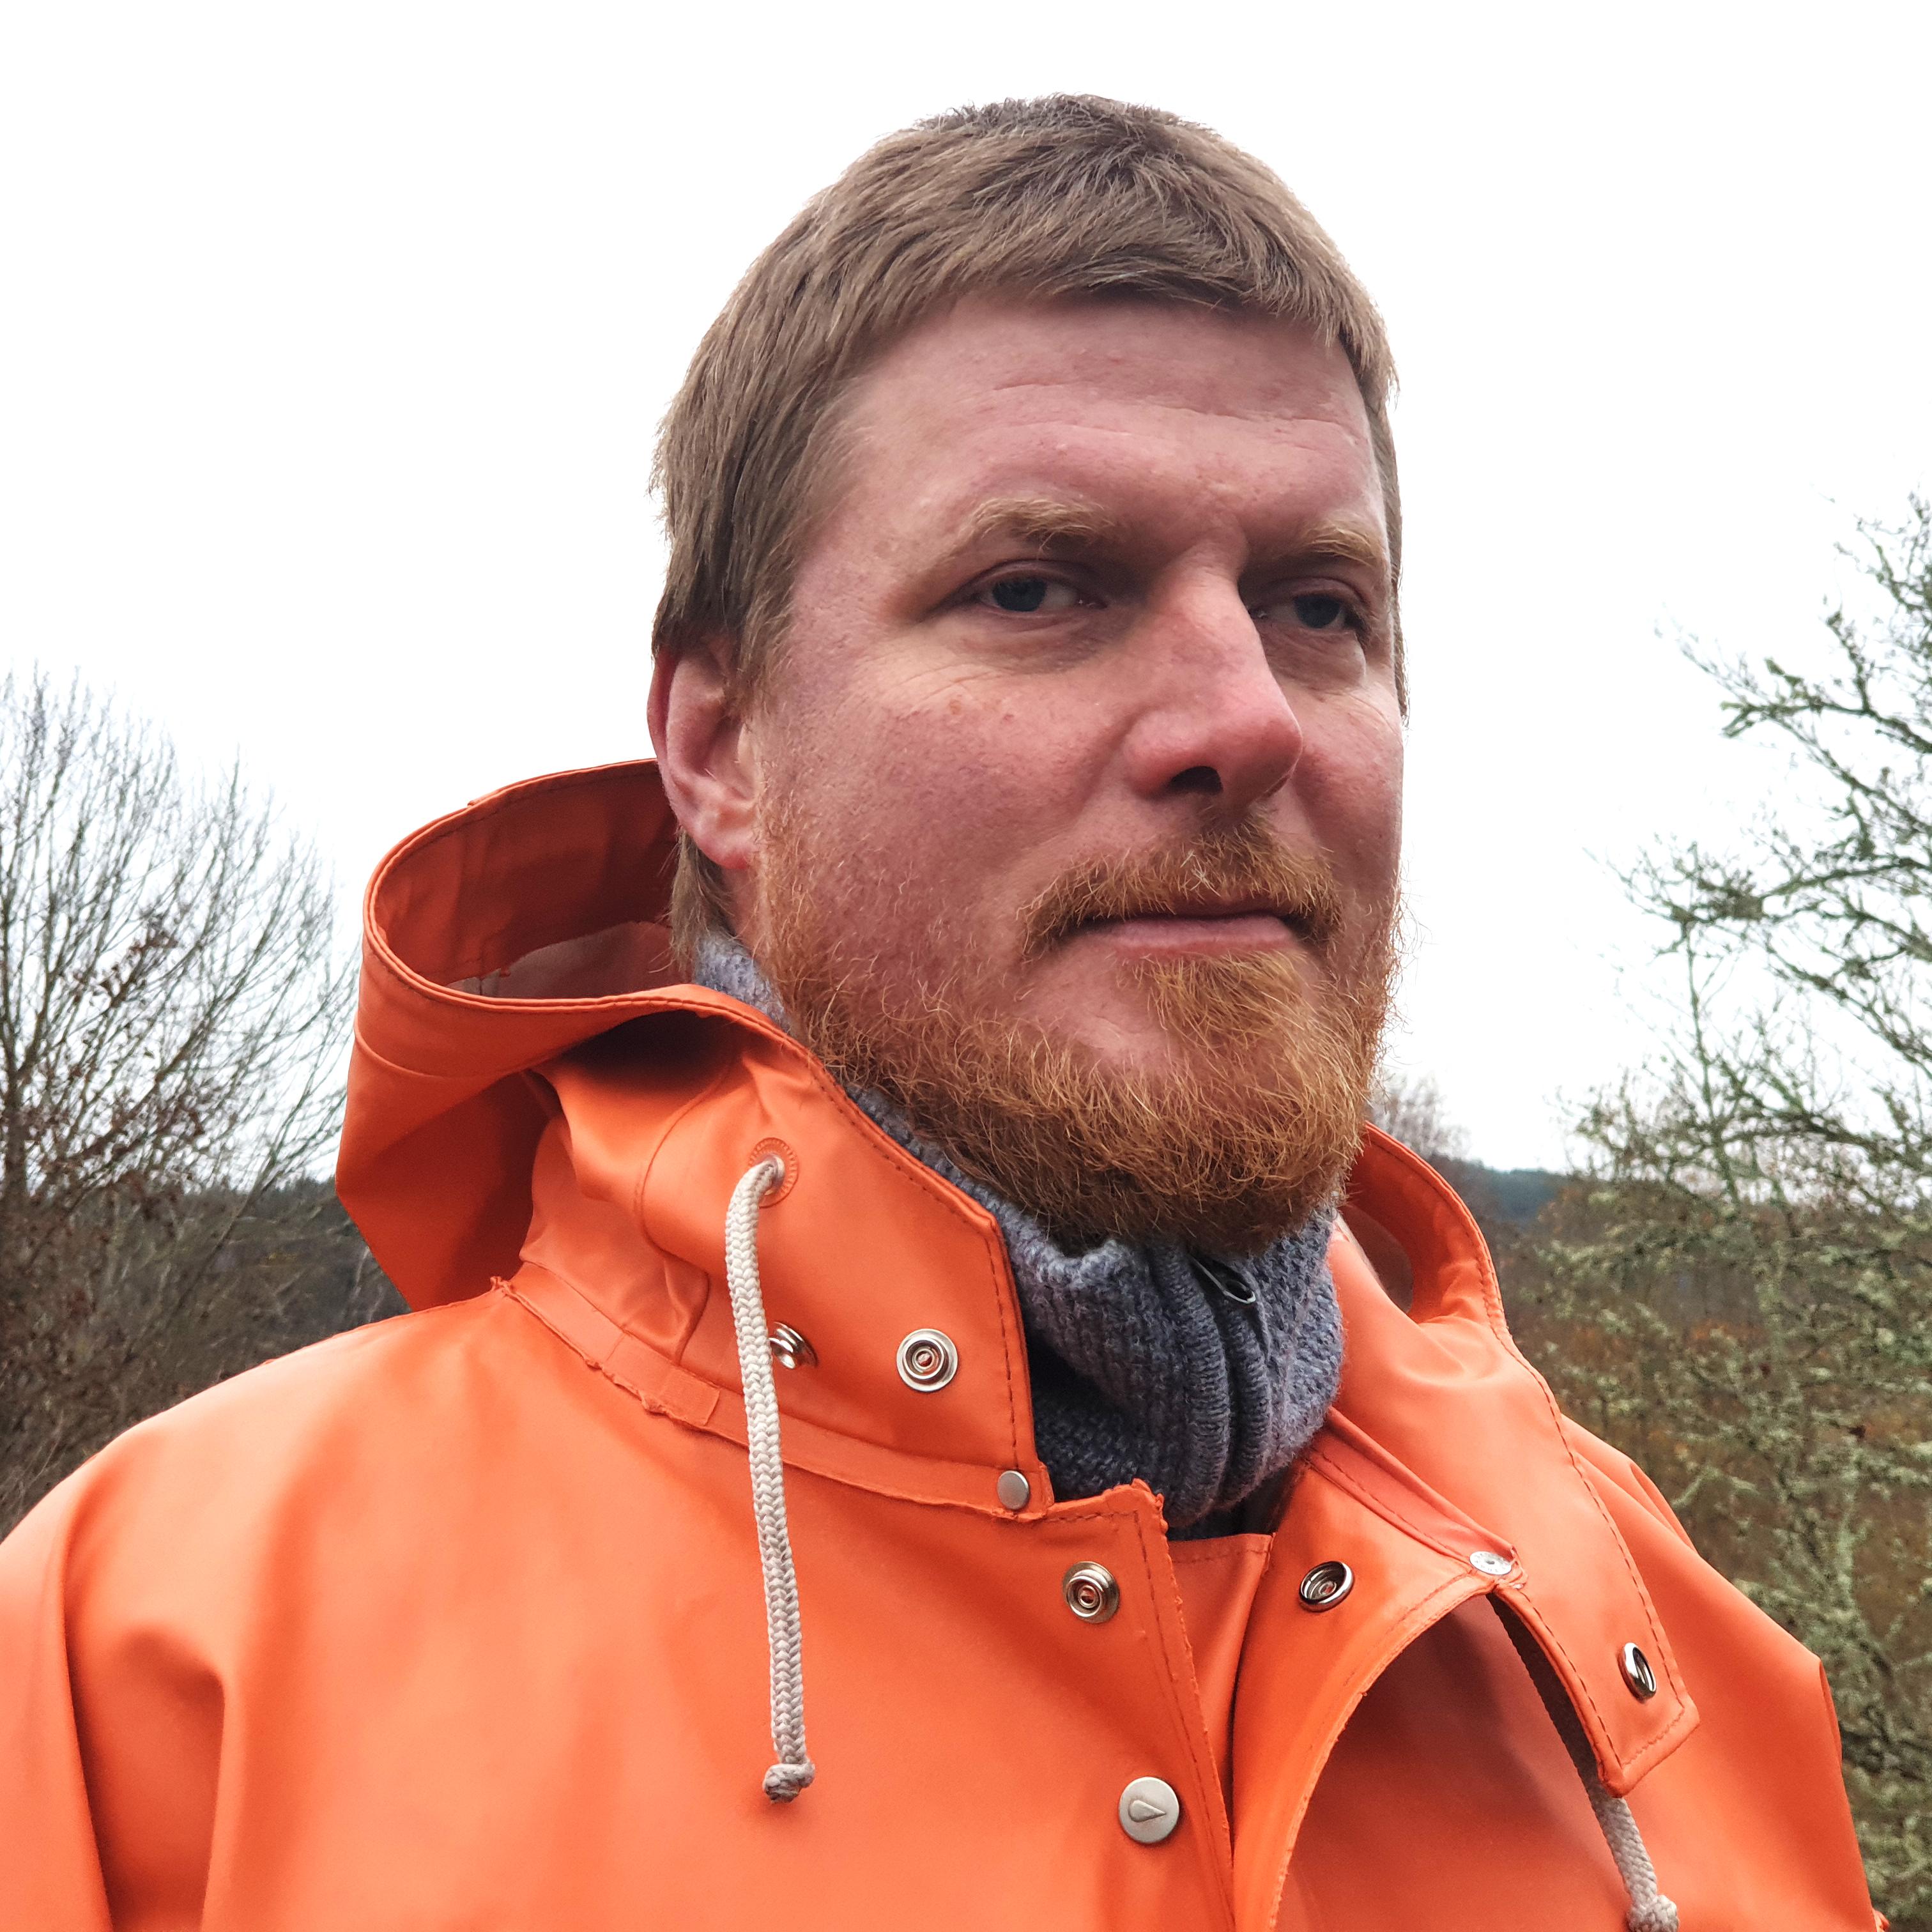 Profile picure of Tomas Eriksson